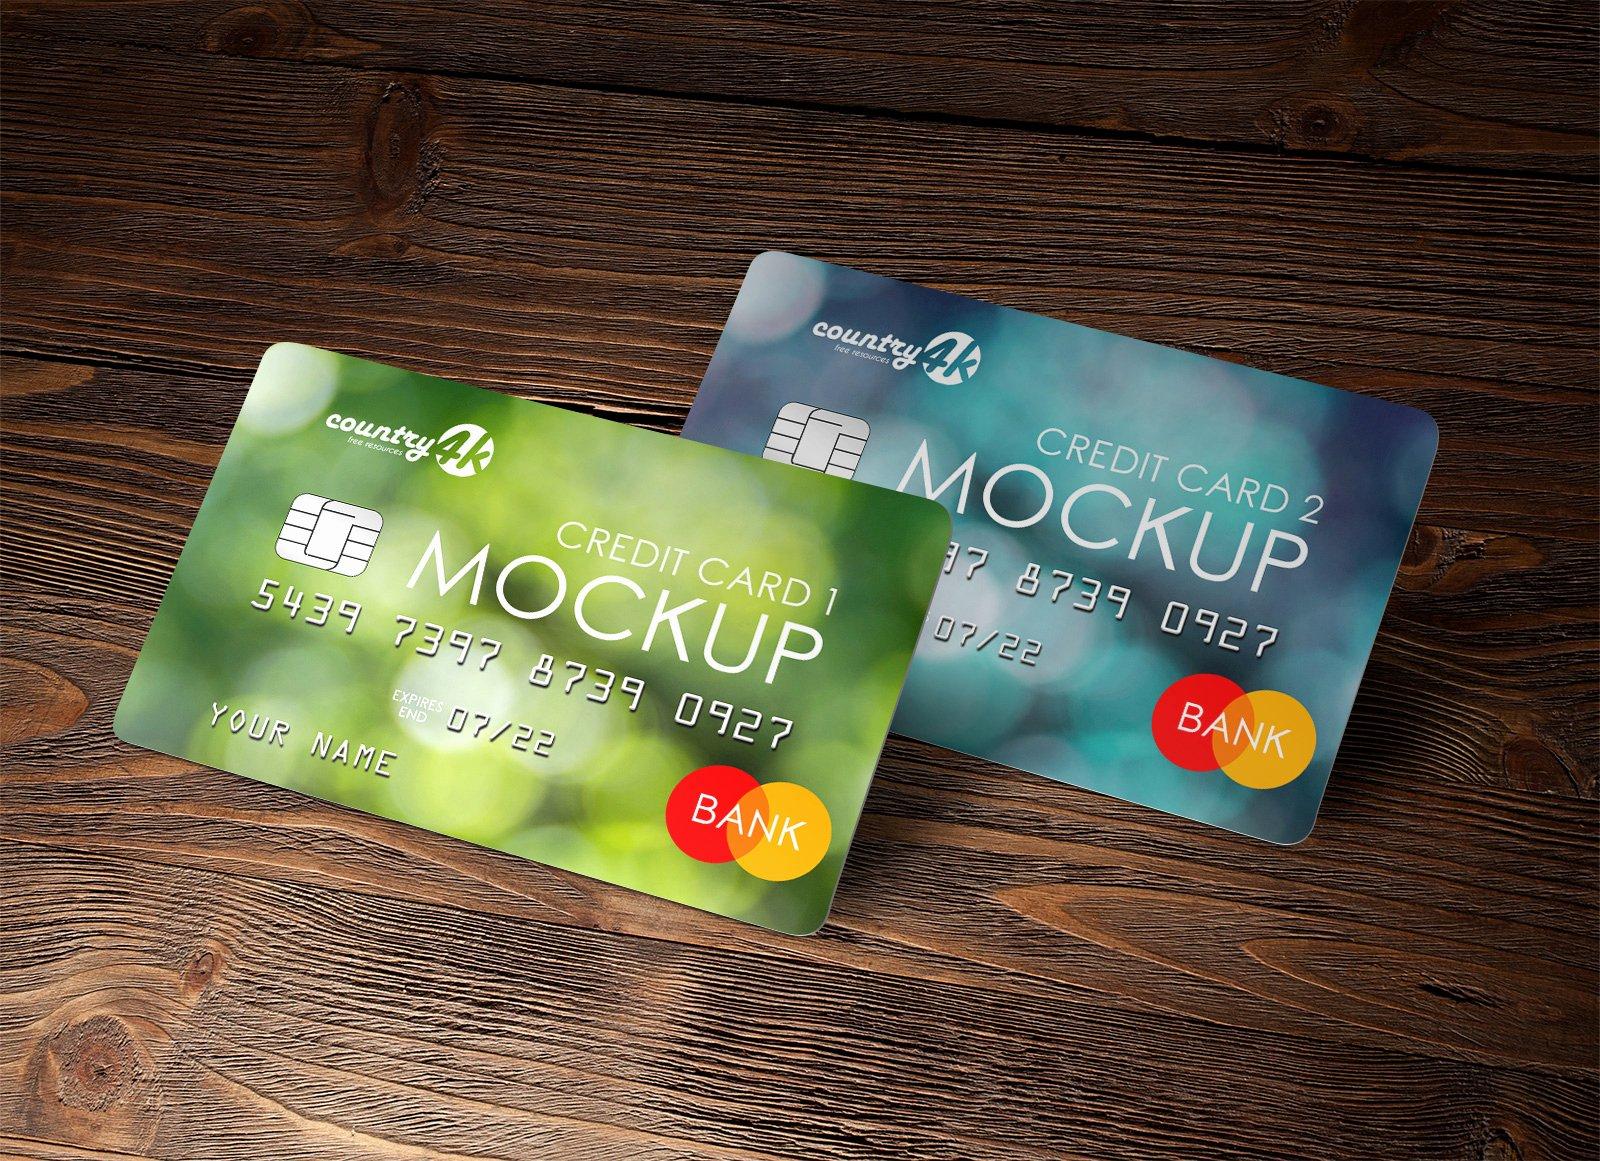 Credit Card Mockup Psd Best Of Free Credit Card Mockup Psd Set Good Mockups